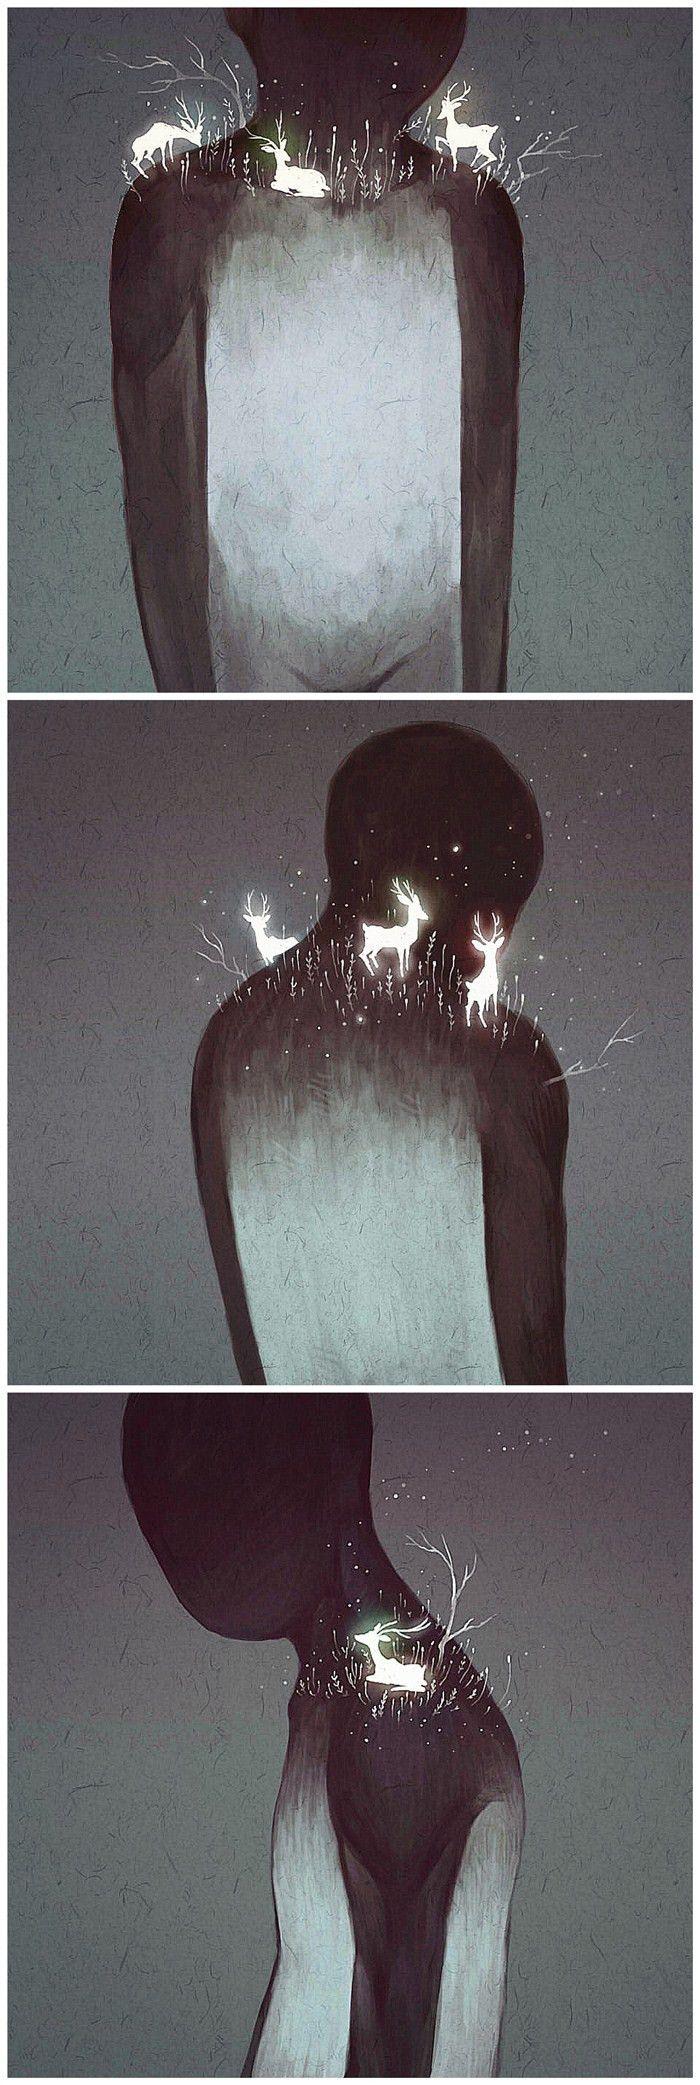 A quiet man - Mountain wood firefly illustration __ Graffiti Kingdom